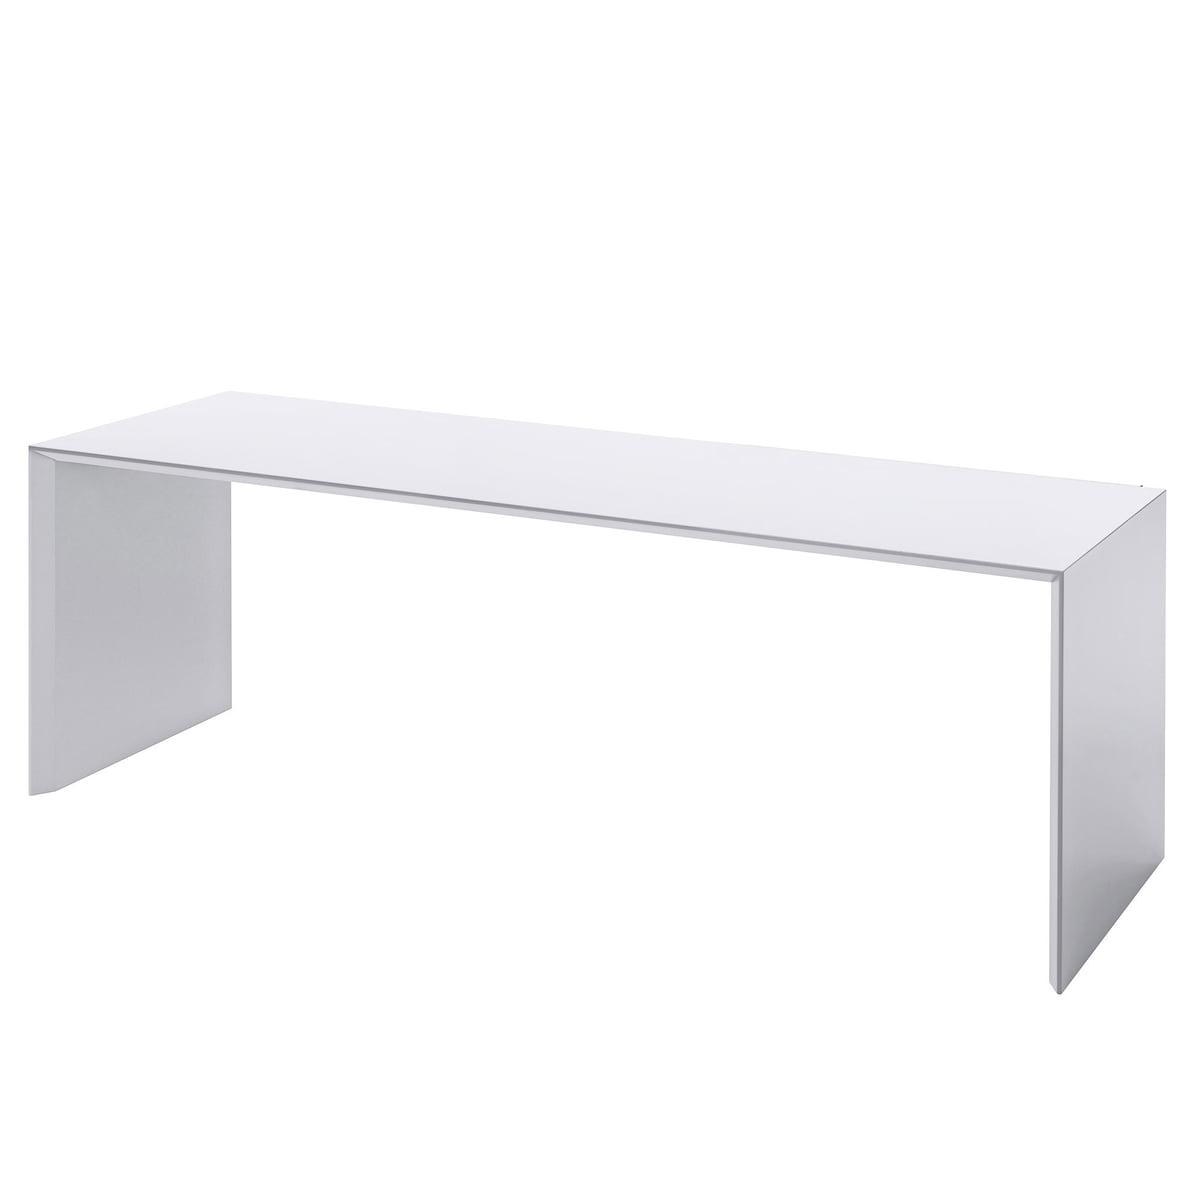 banc add on par sch nbuch connox shop. Black Bedroom Furniture Sets. Home Design Ideas